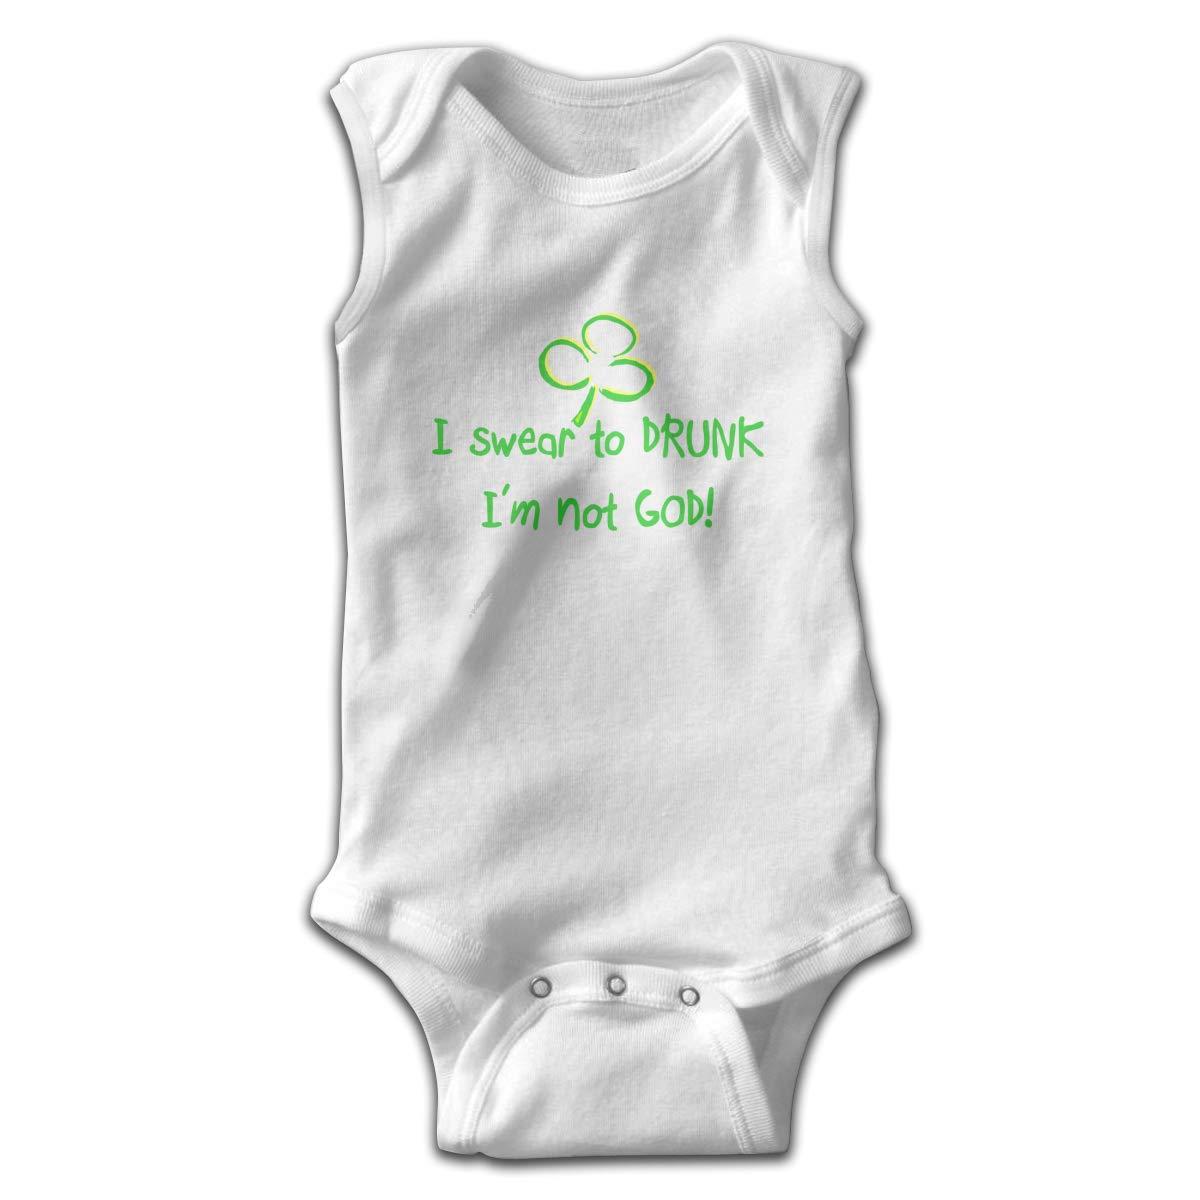 Infant Baby Girls Rompers Sleeveless Cotton Onesie,I Swear to Drunk I Am Not God Bodysuit Winter Pajamas